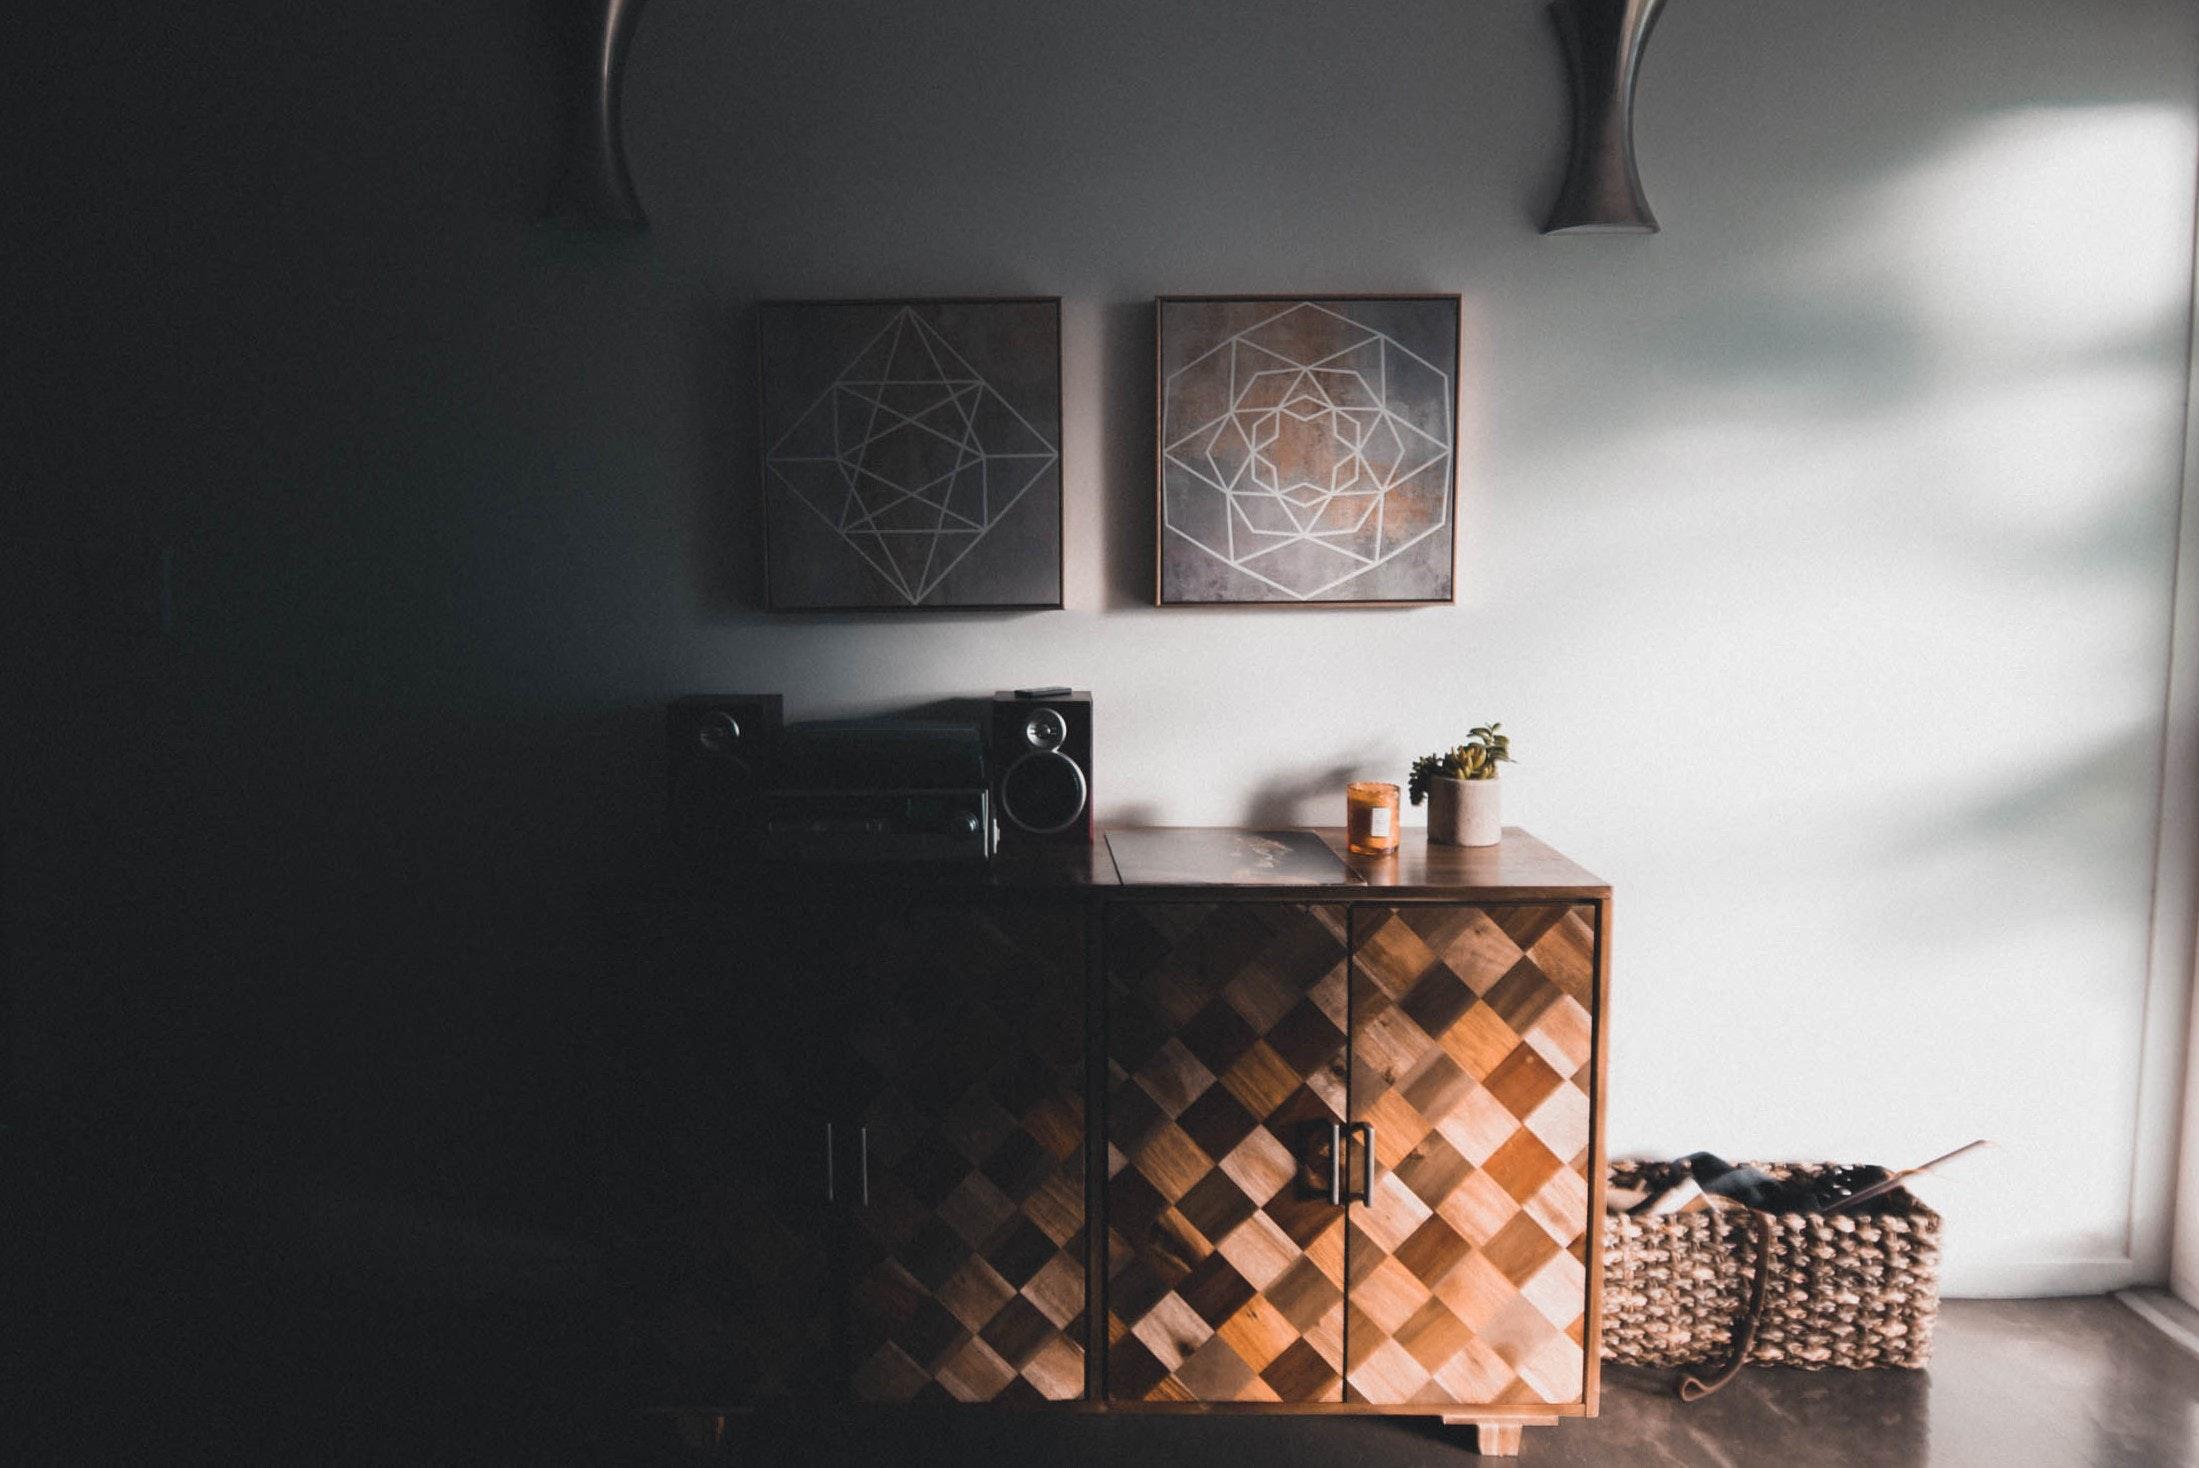 Black Audio Speaker on Brown Wooden Cabinet, Living room, Wood, Wall, Vinyl, HQ Photo